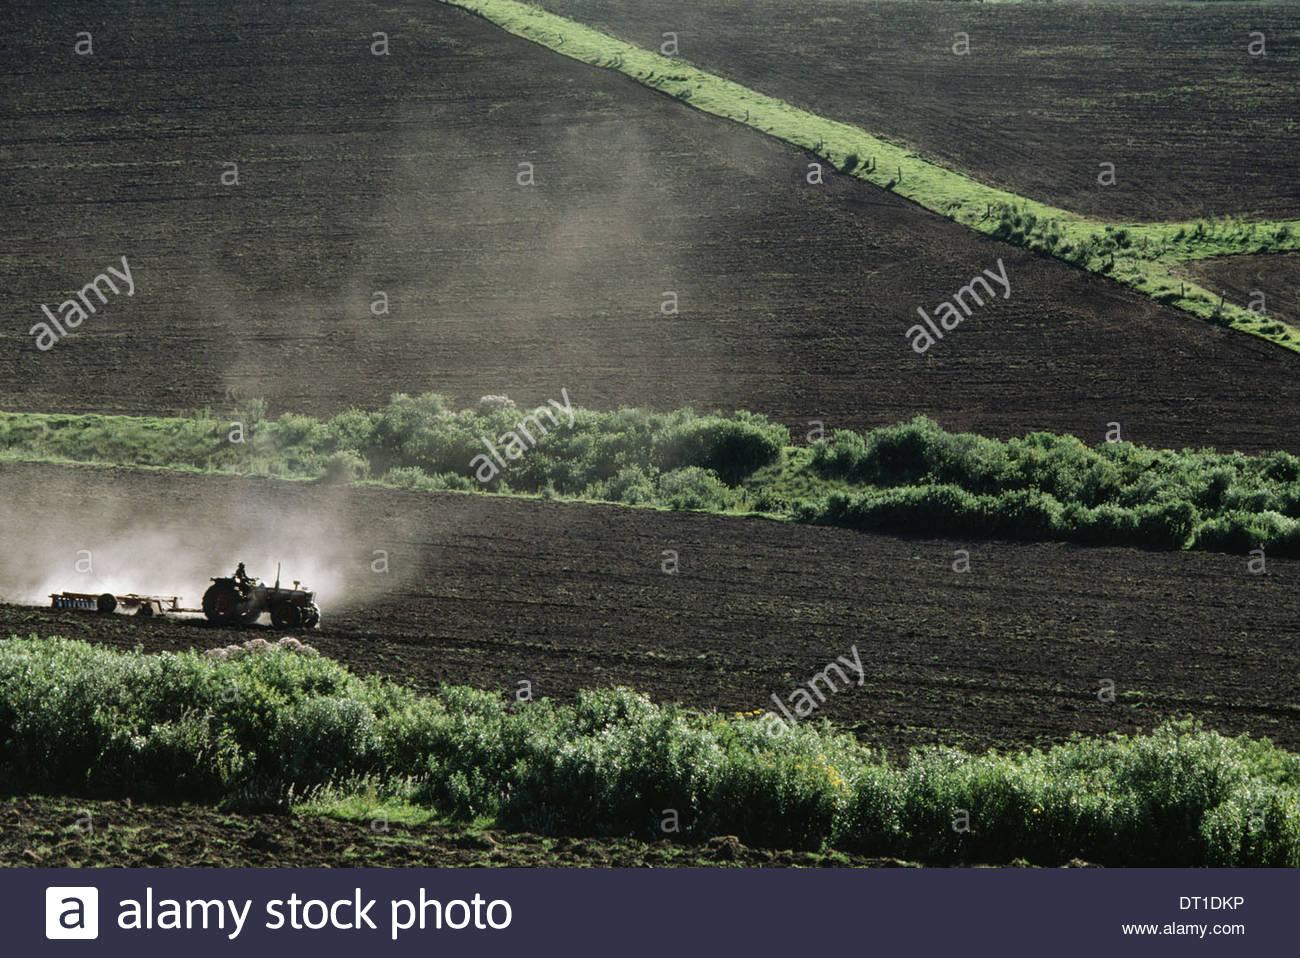 Kenia-Traktoren Körper Boden Bauernhof gelöscht vor kurzem Kenia Stockbild